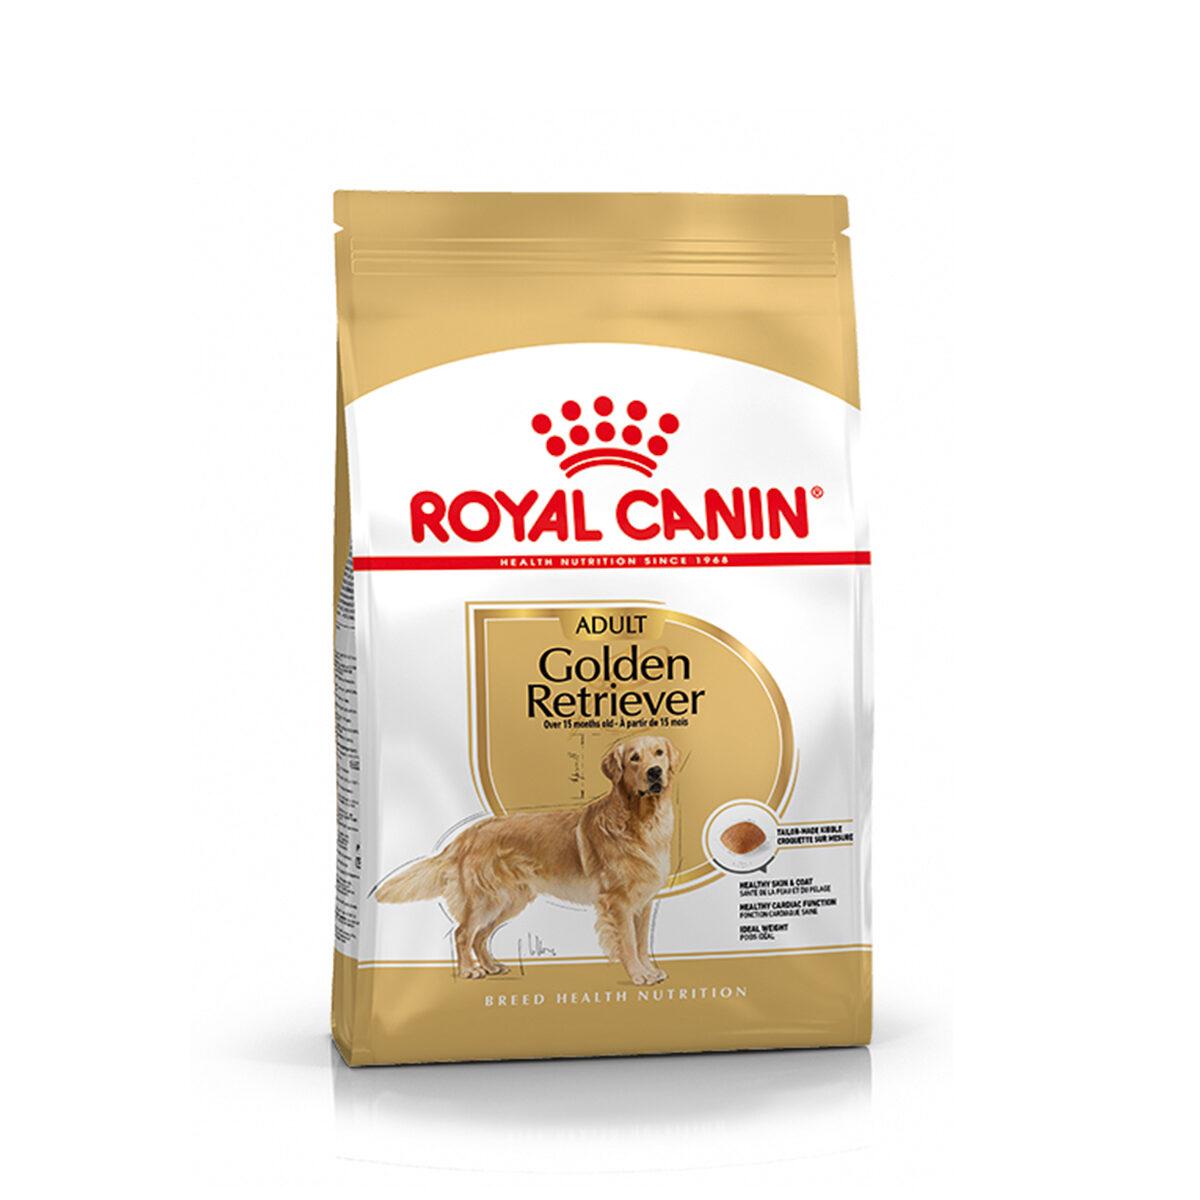 Royal Canin Golden Retriever Hondenvoer Adult 3 kg